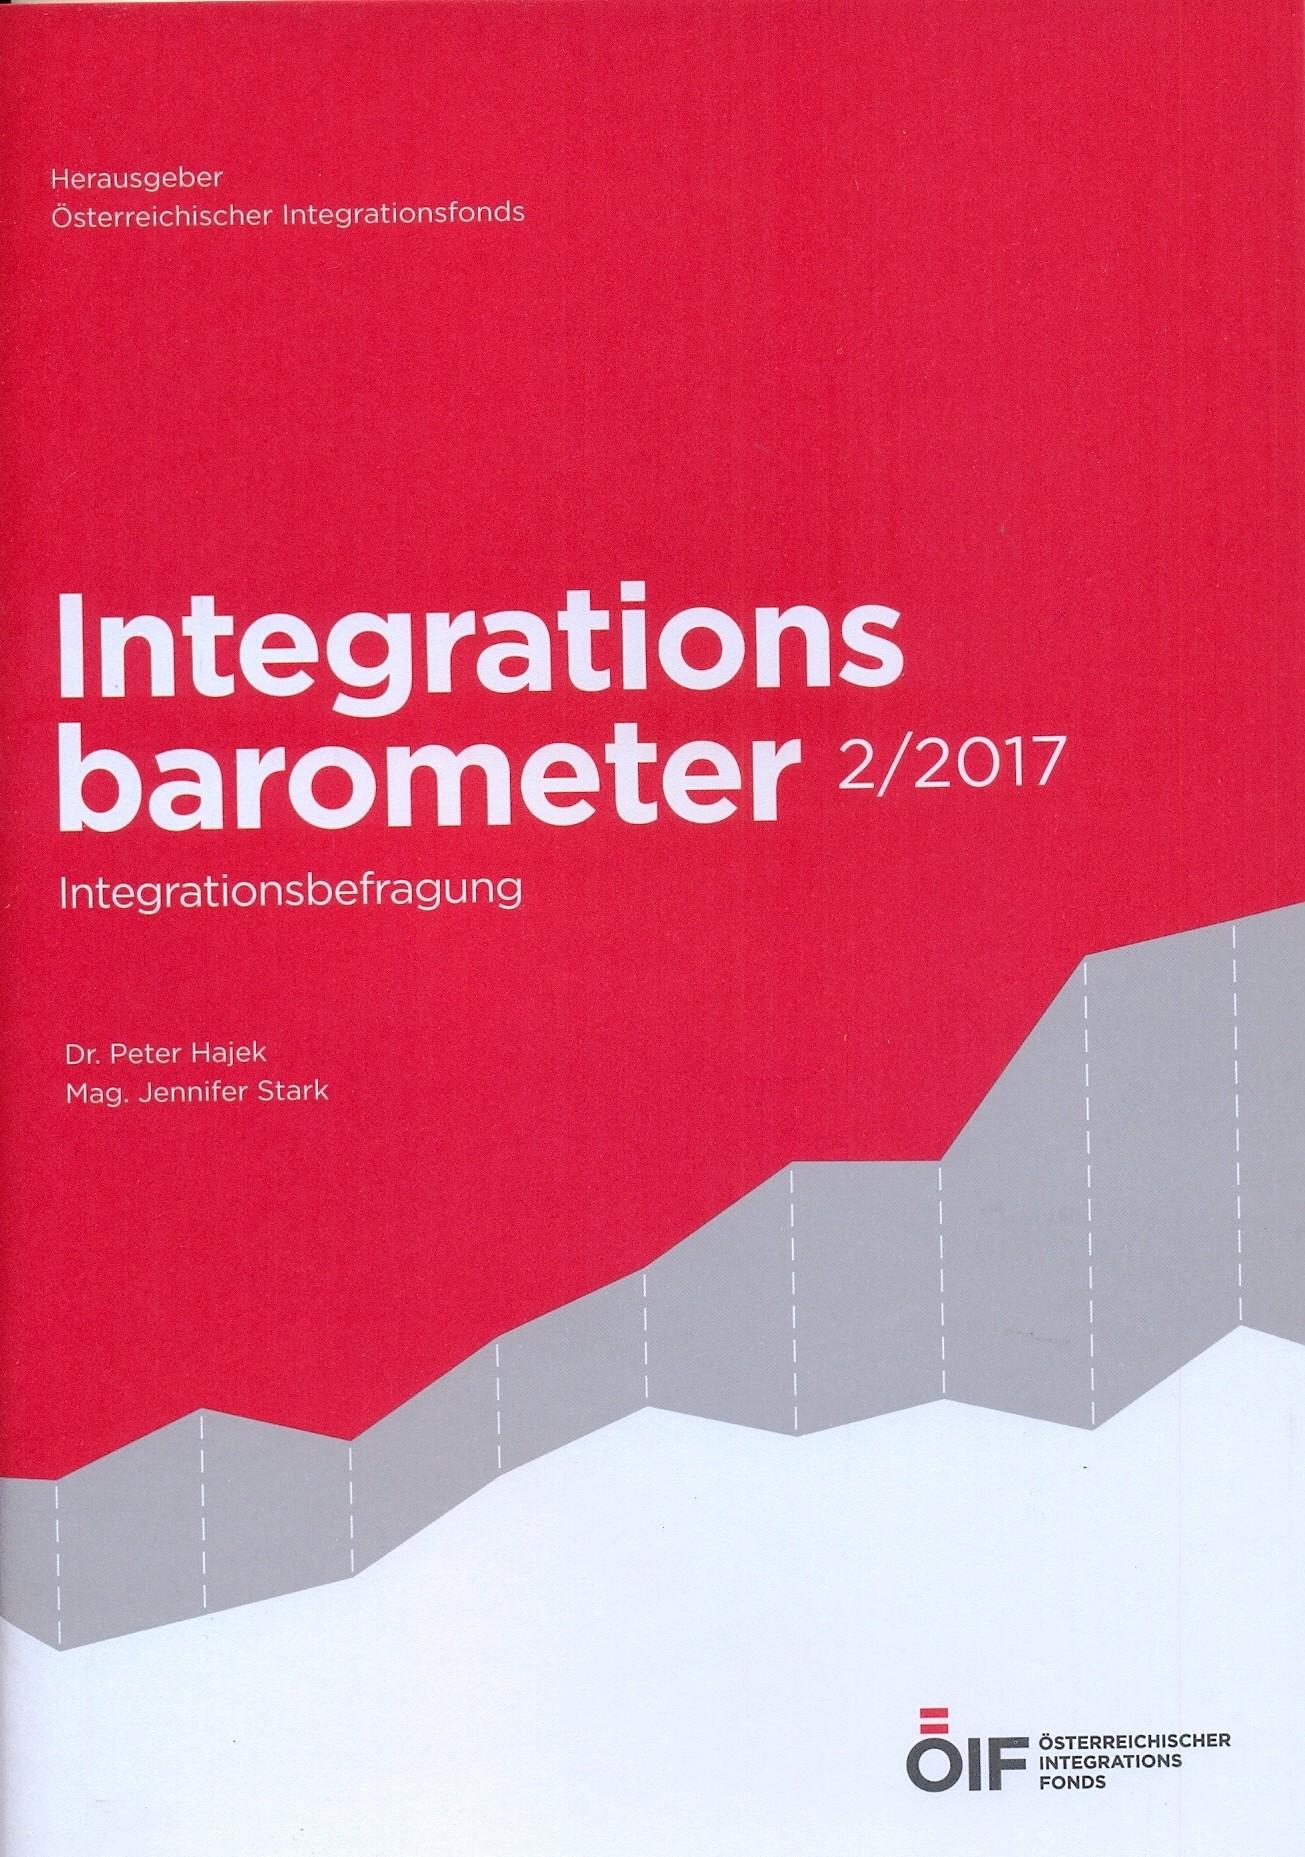 Integrationsbarometer 2/2017